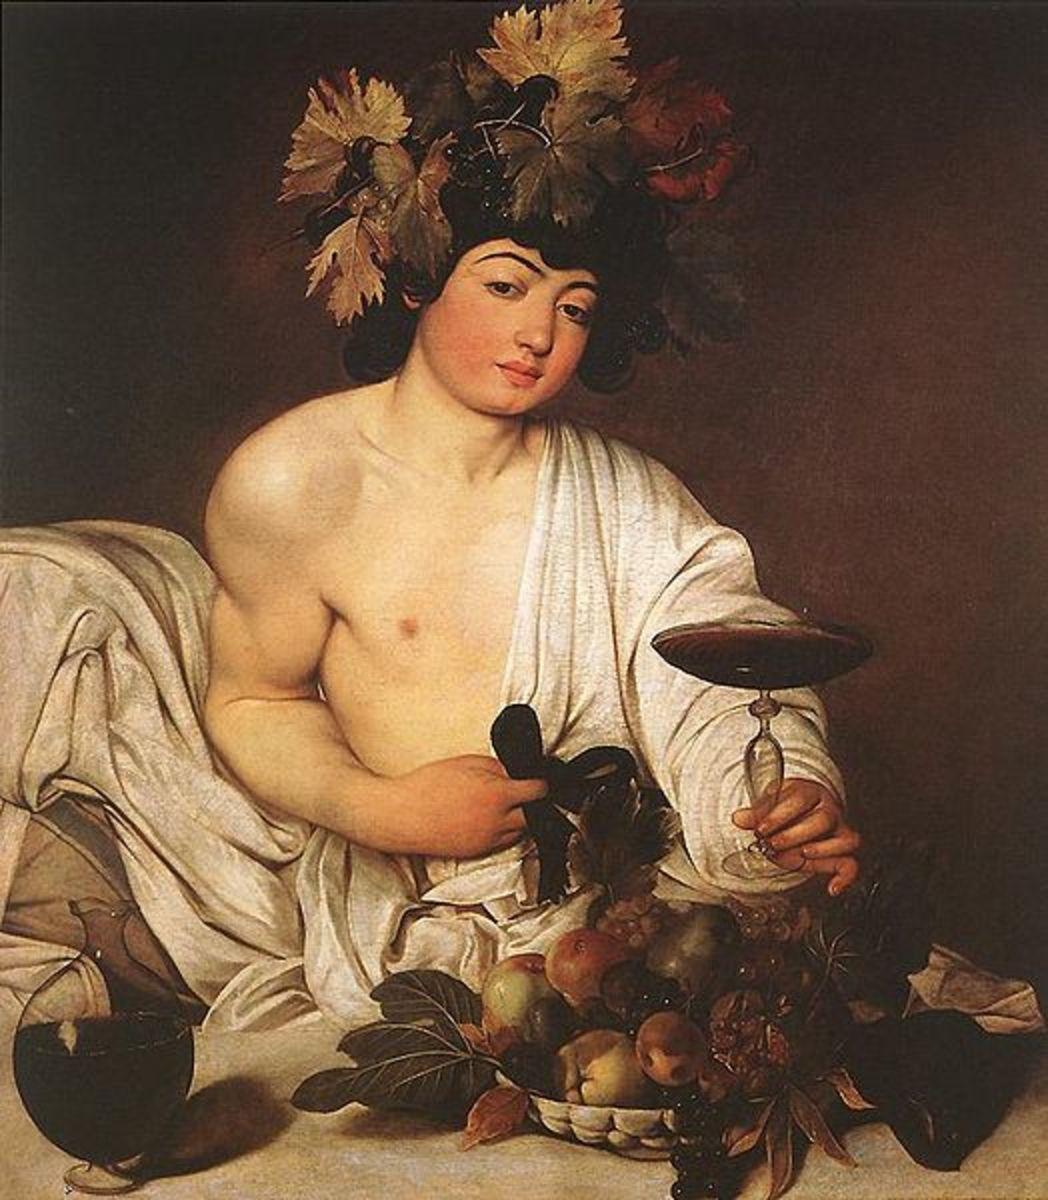 Dionsysus Son of Semele - Caravaggio (1571–1610) - PD-art-100